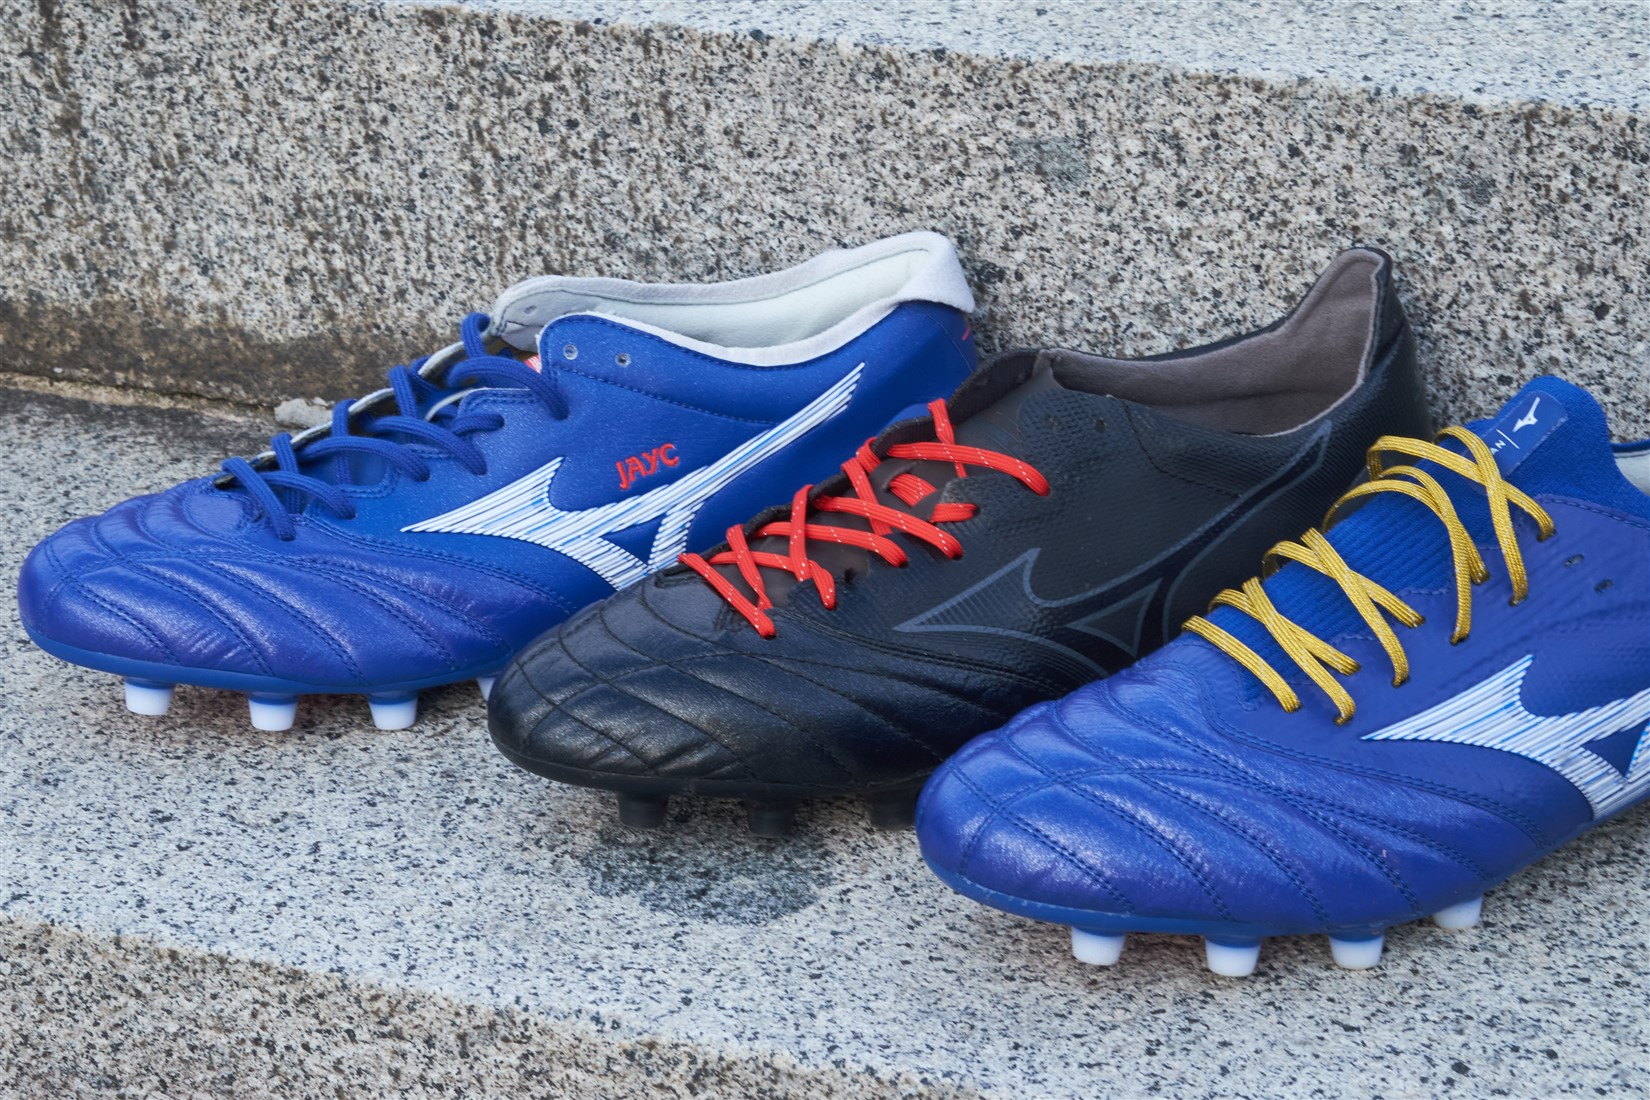 Mizuno Morelia Neo 3 Japan, Mizuno Morelia Neo 3 beta and the Mizuno Morelia Neo 2 beta football boots soccer cleats japanese football boots